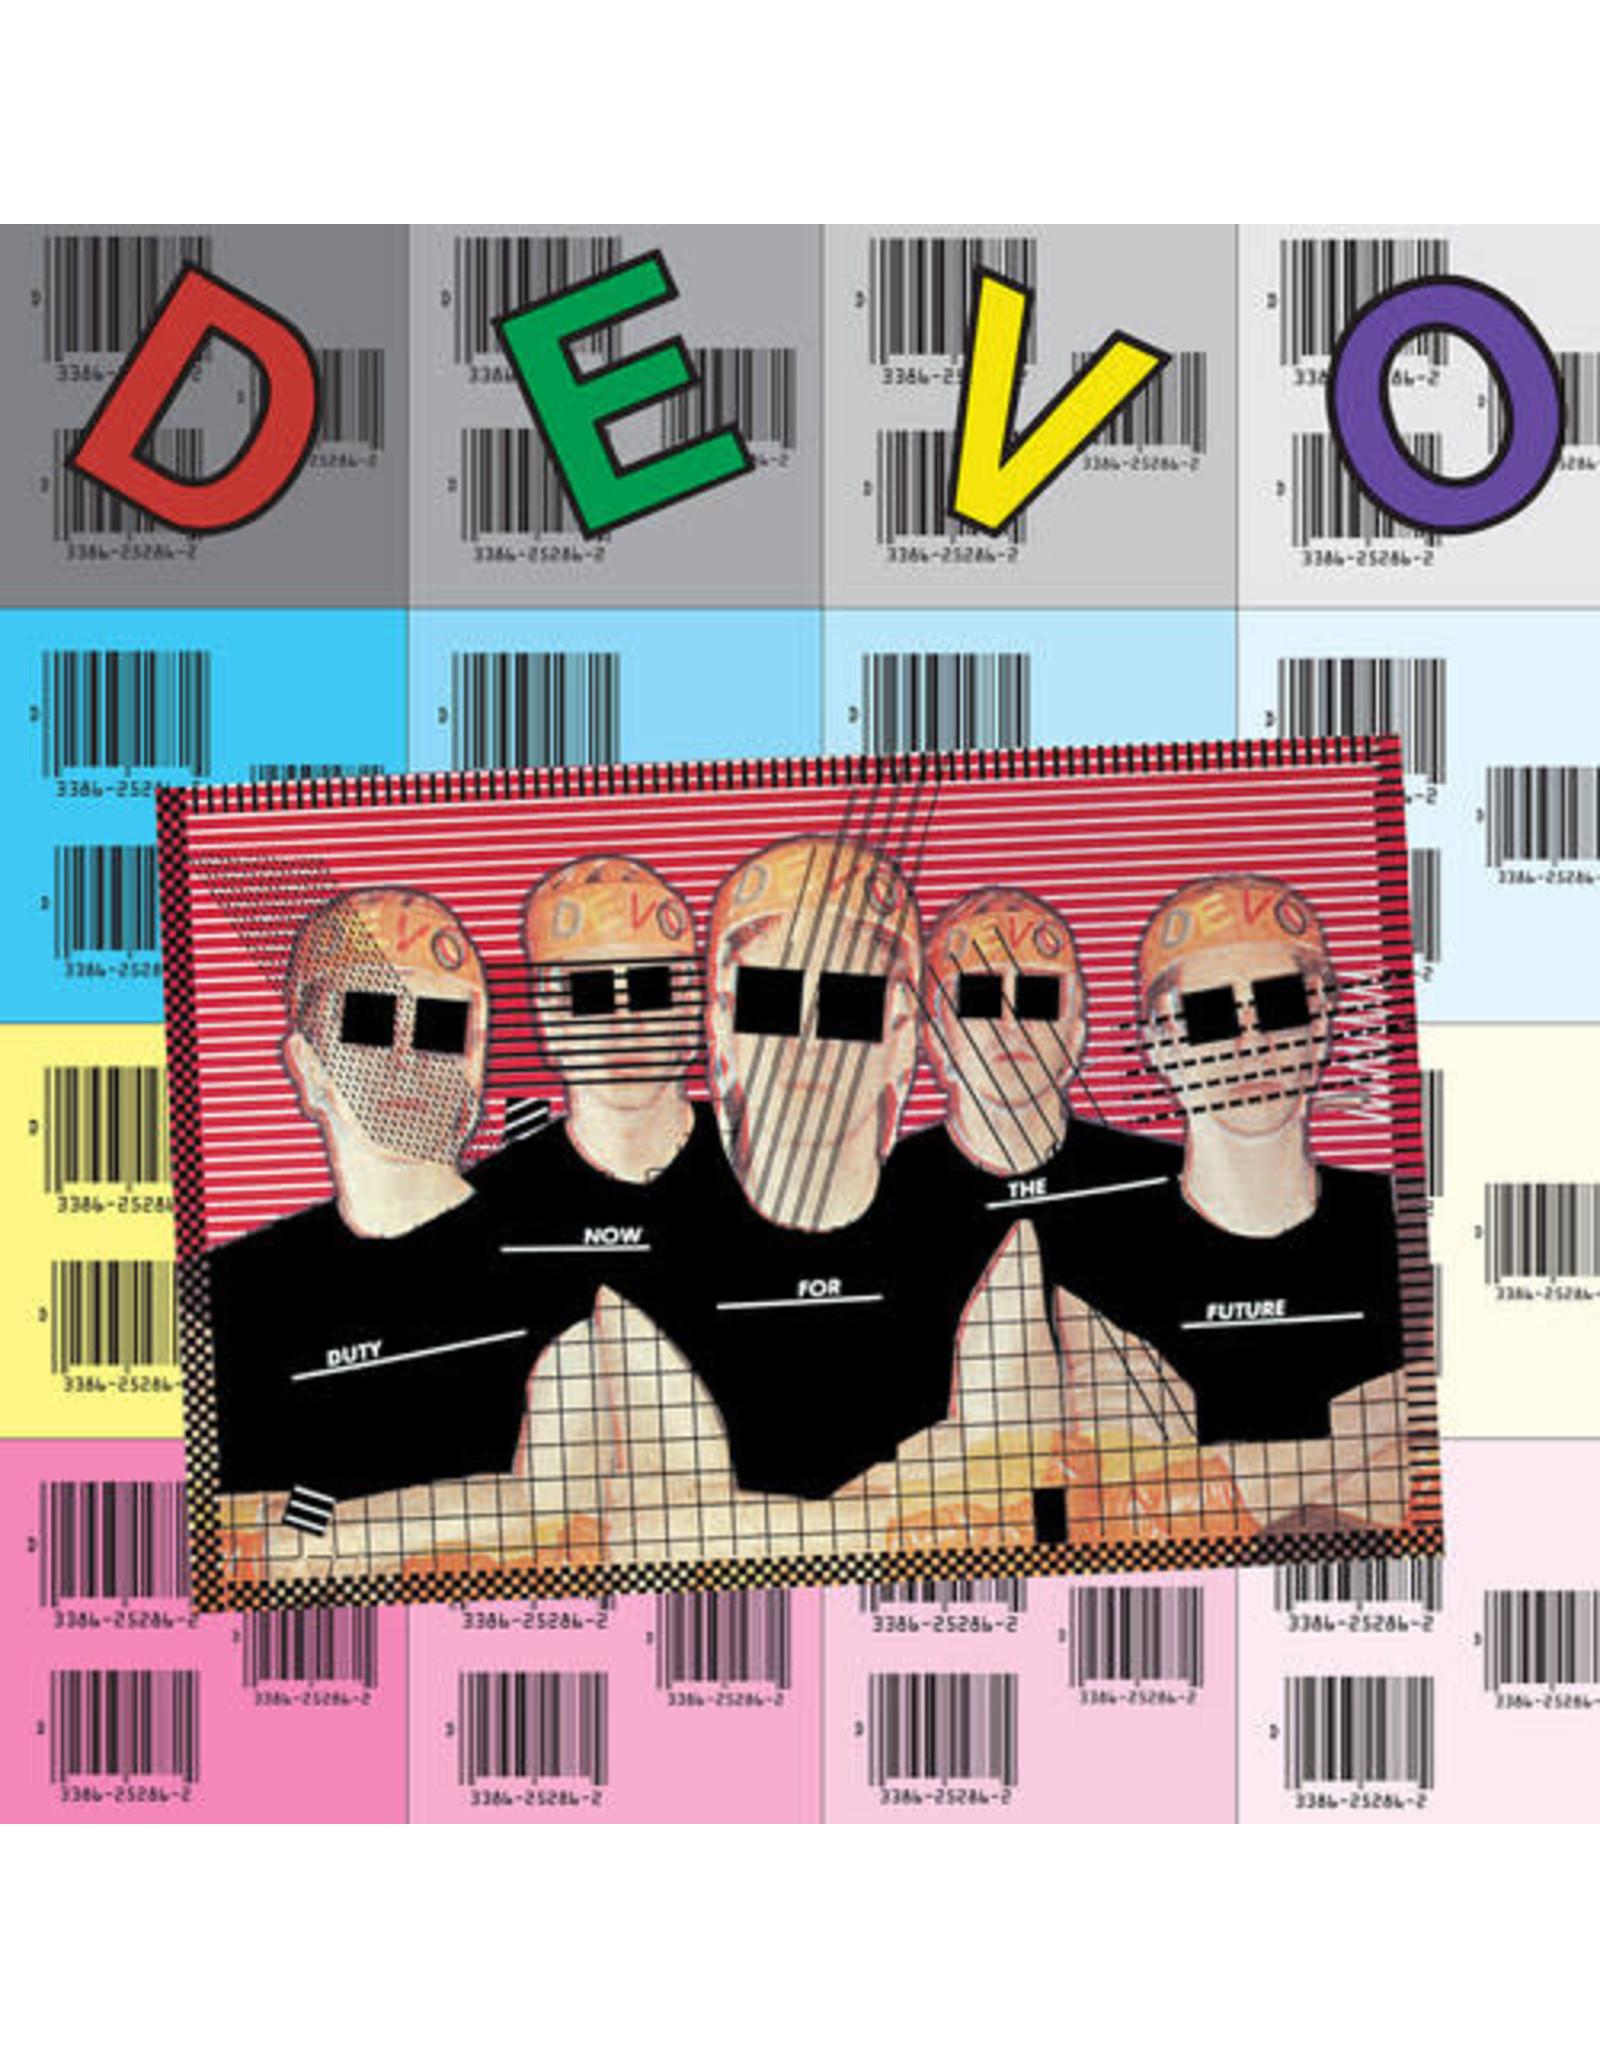 New Vinyl Devo - Duty Now For The Future (Colored) LP